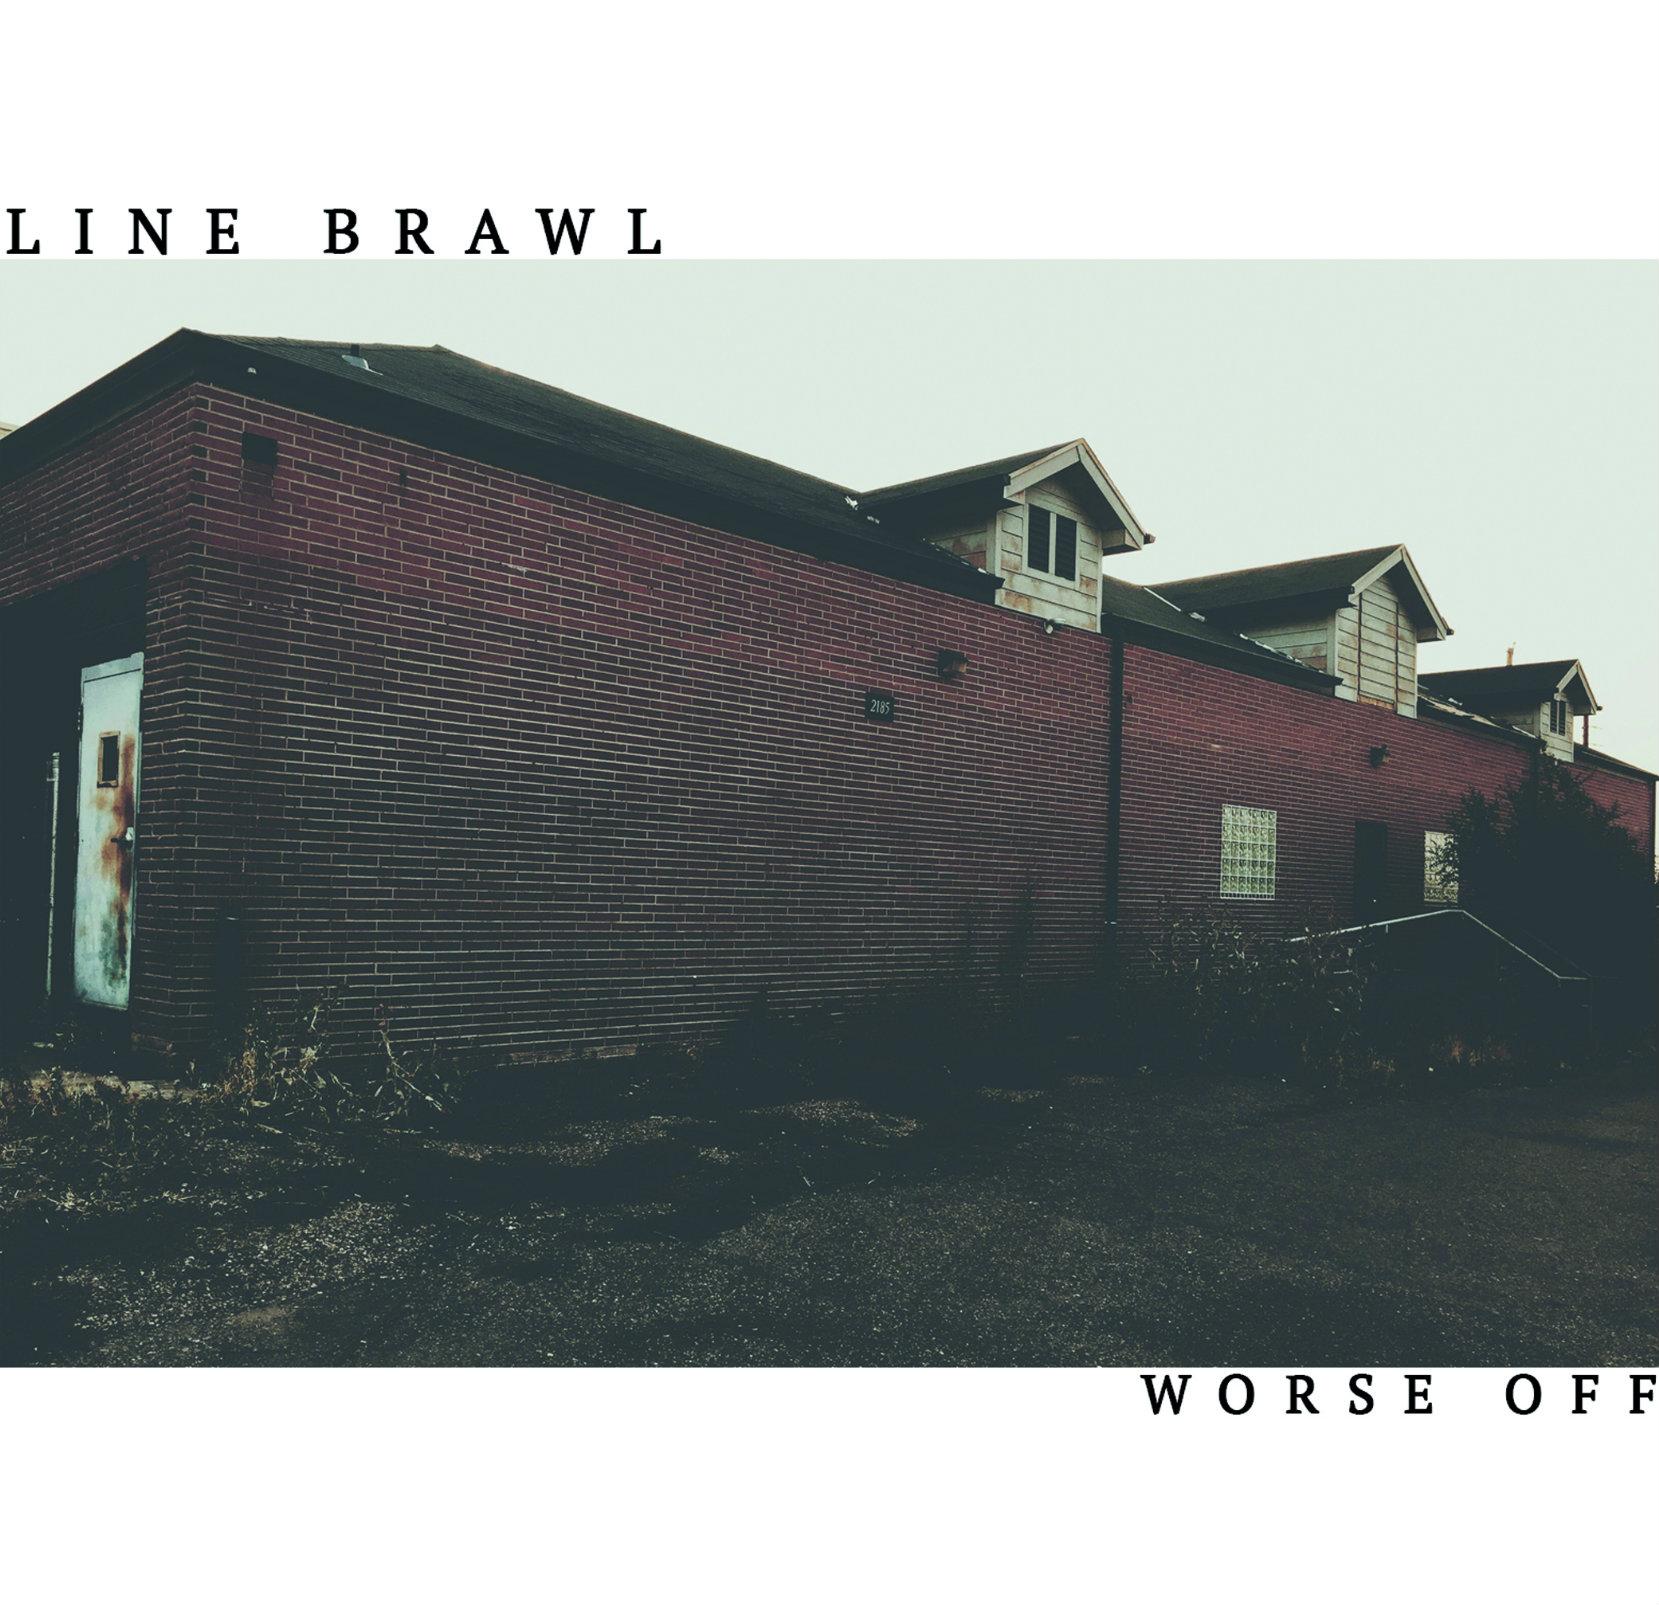 Line Brawl